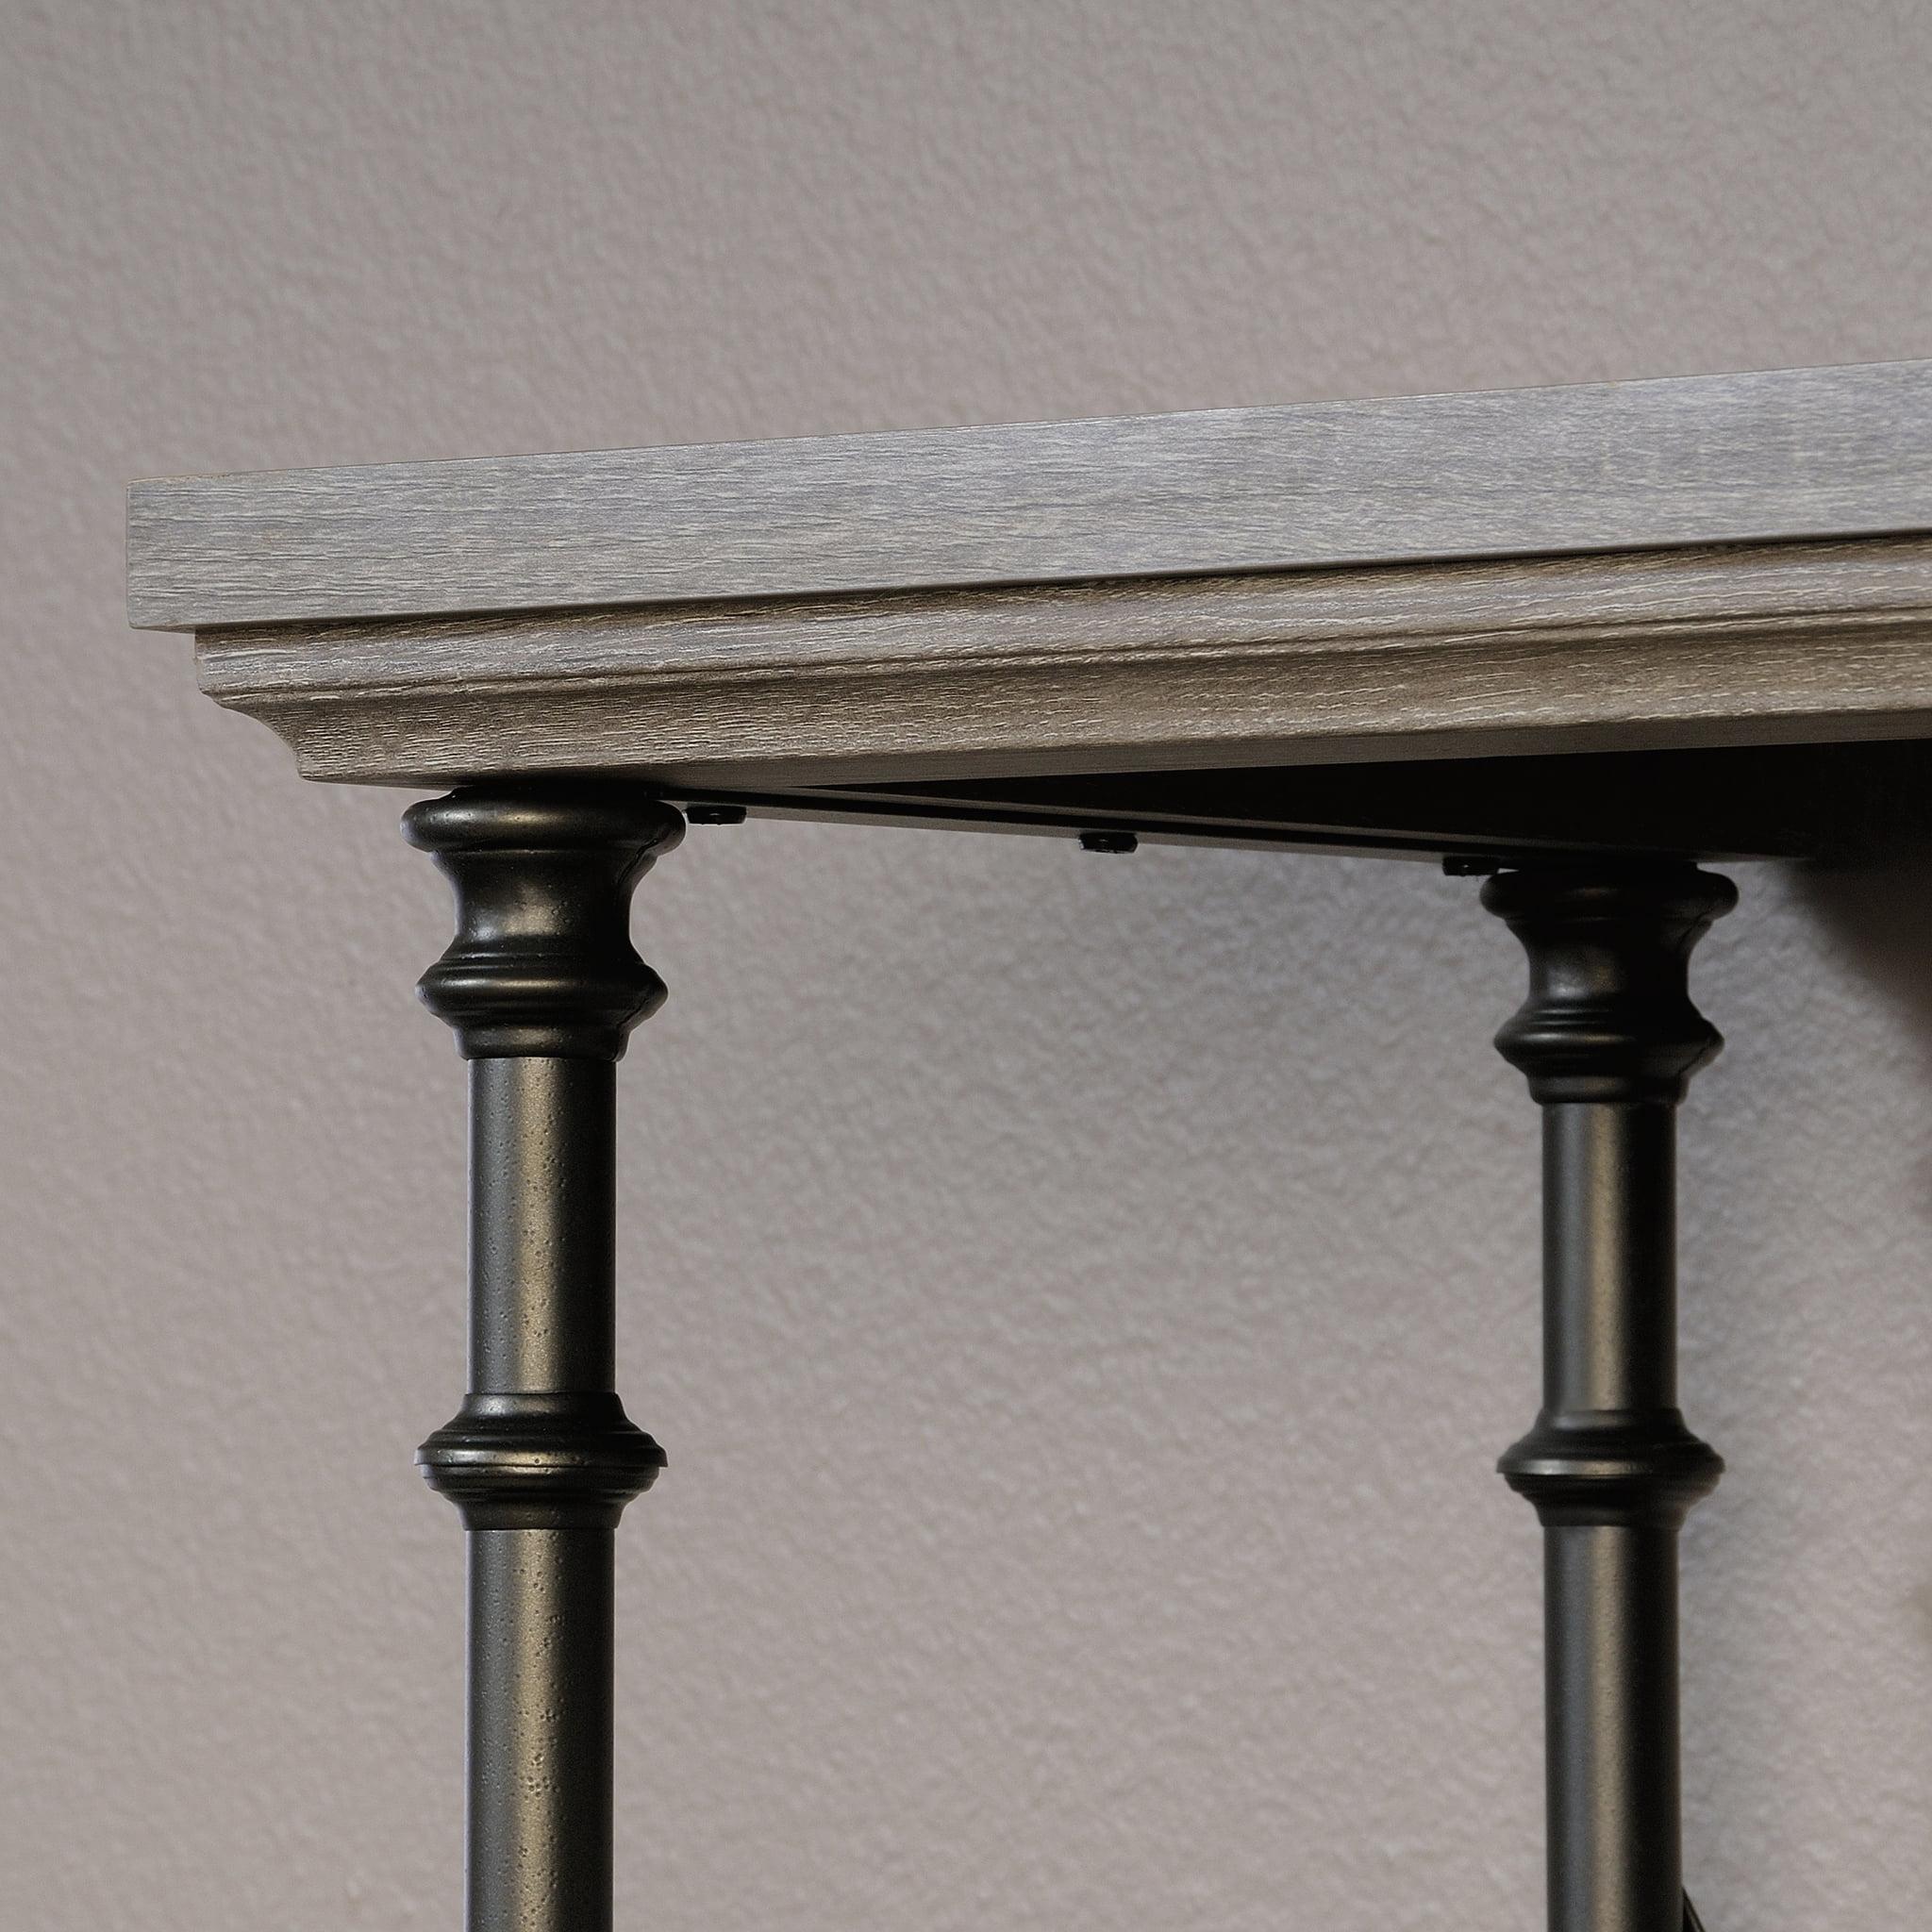 Sauder 419228 Canal Street 5-Shelf Bookcase 15.51 x H 70.00 L 29.53 x W Northern Oak finish